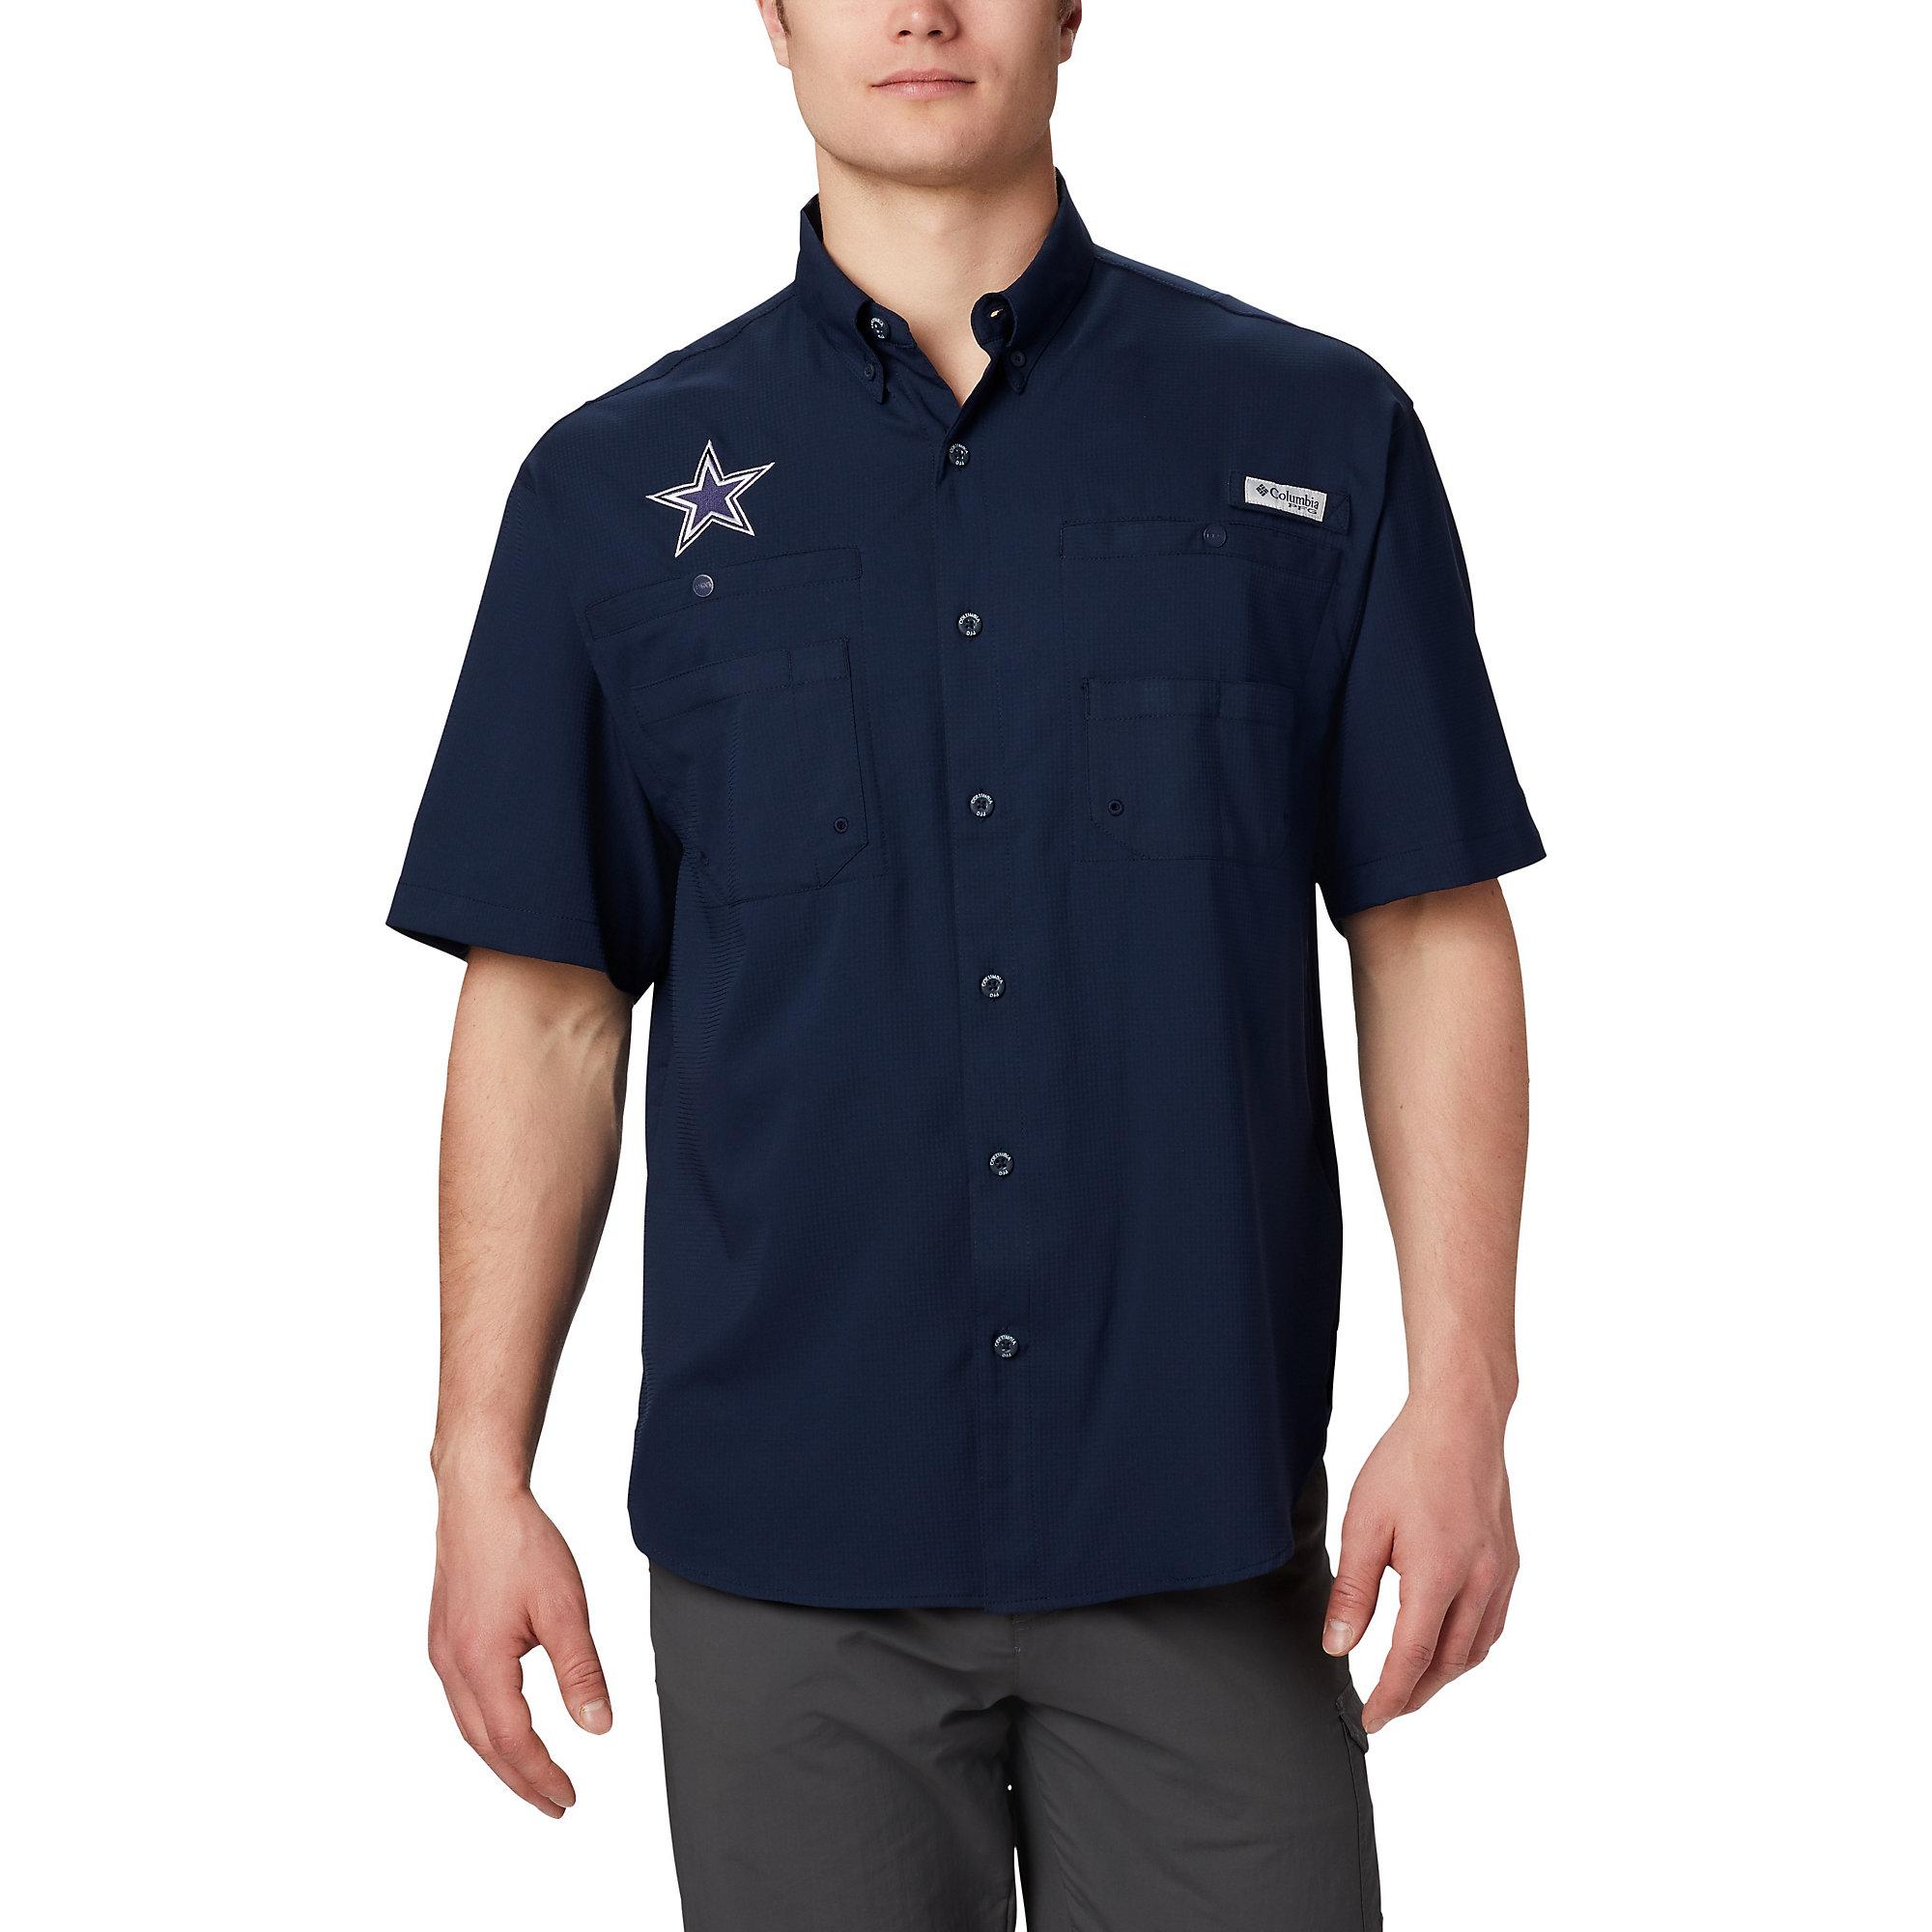 Columbia Omni-Dry Tamiami Short Sleeve Shirt